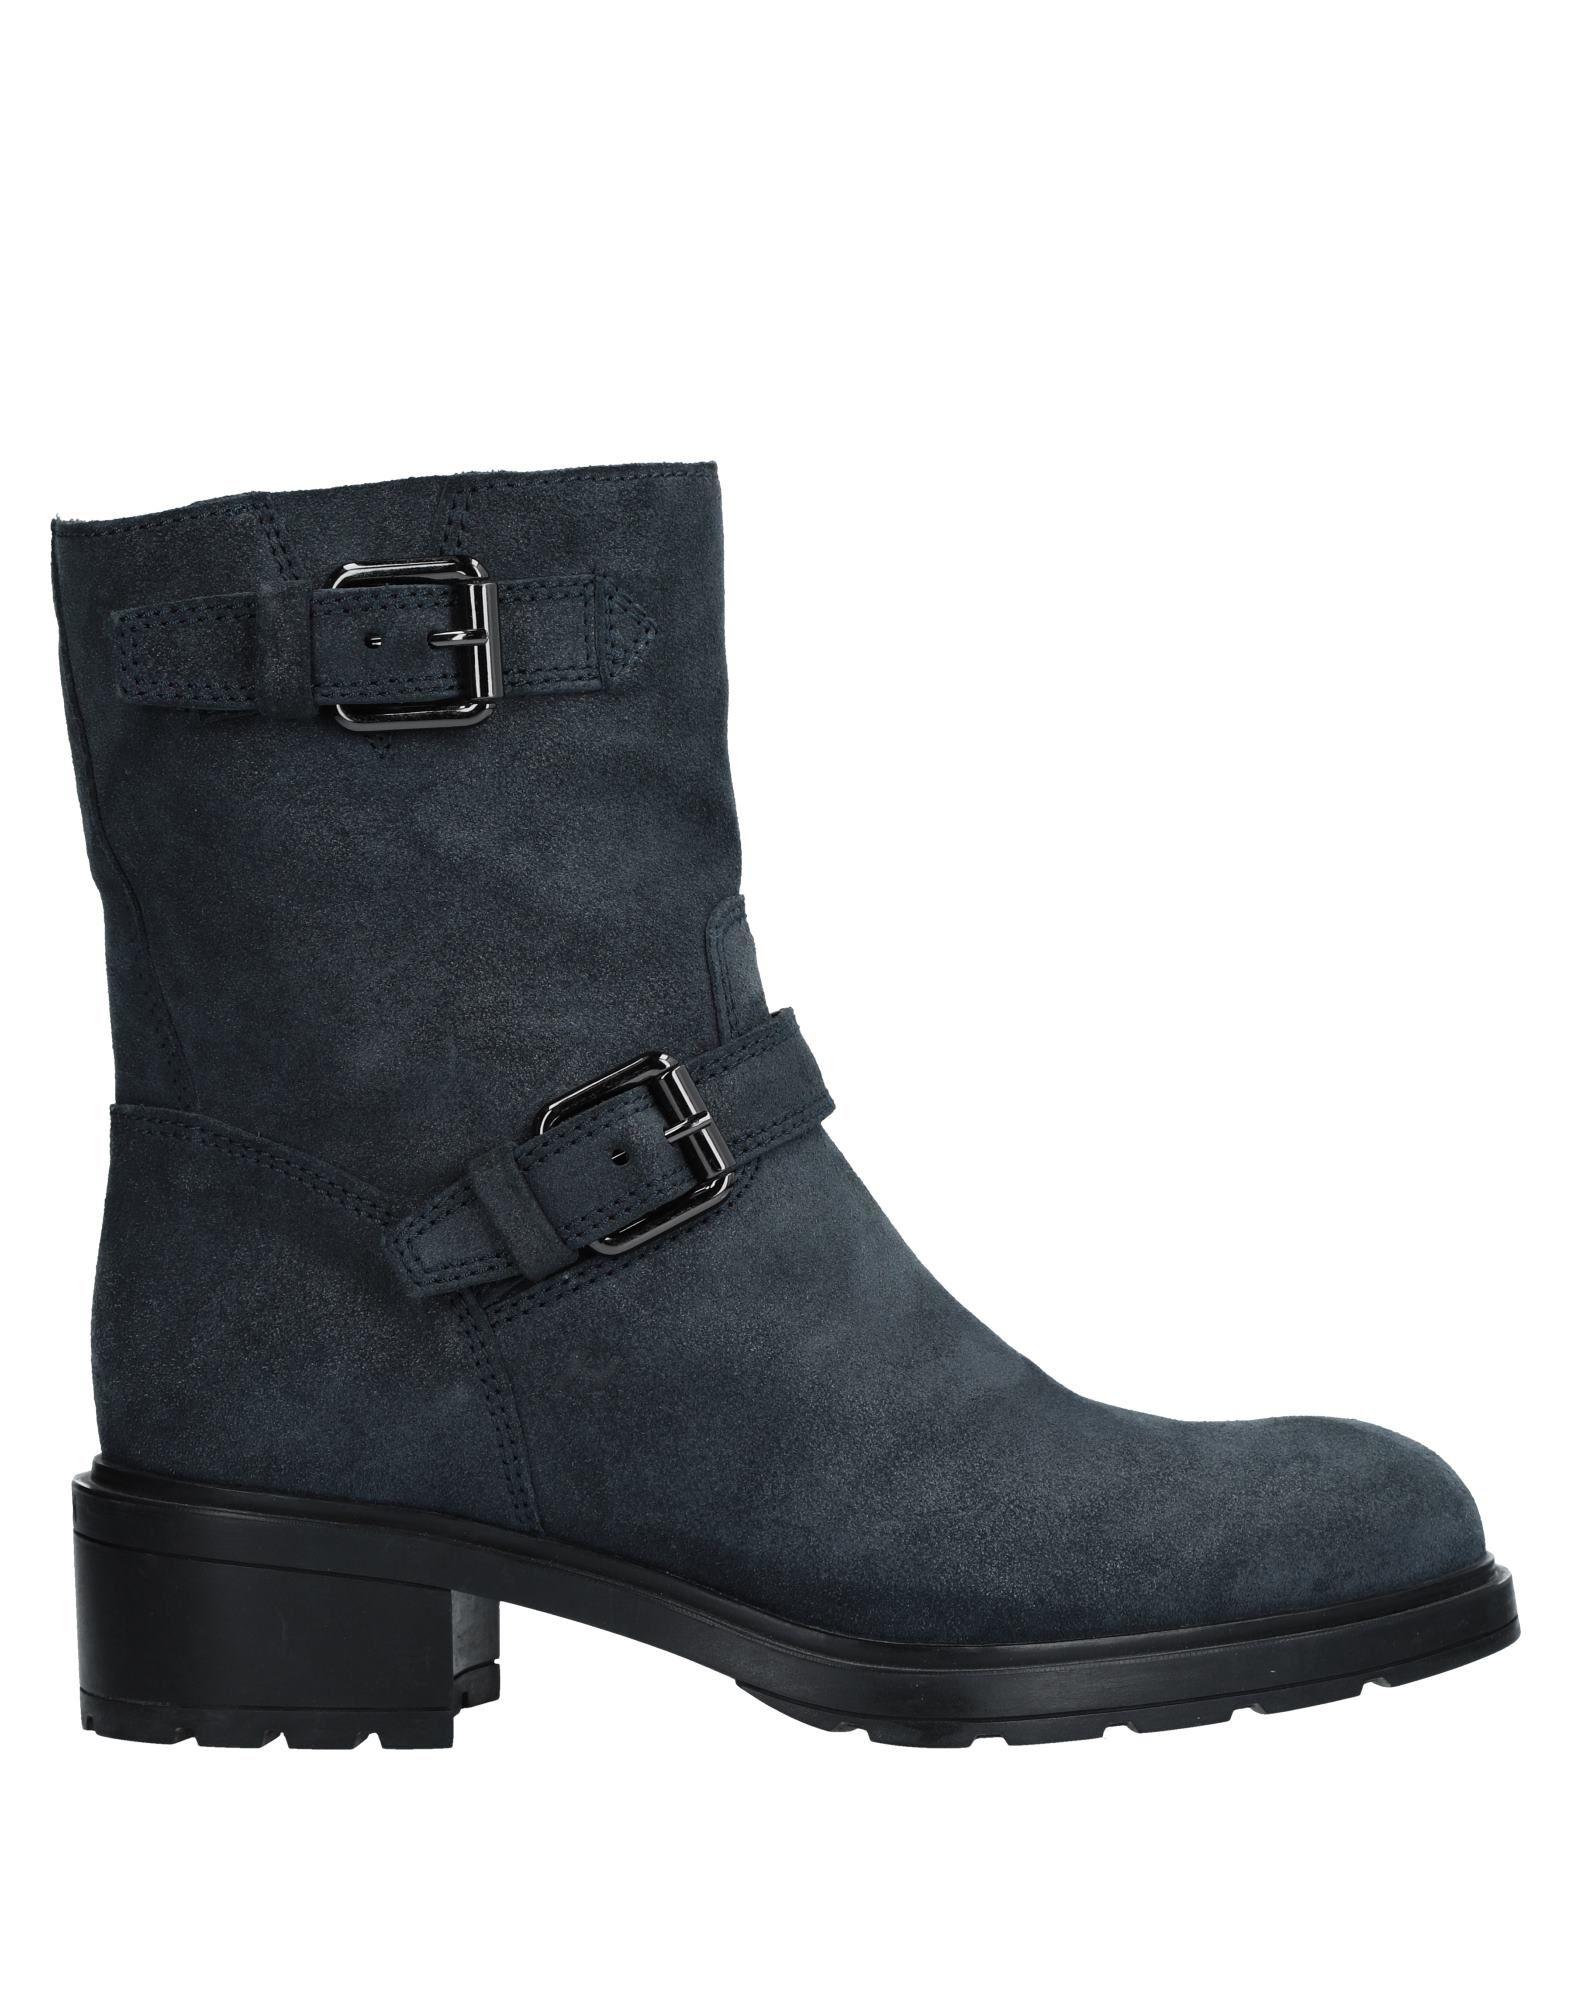 Rabatt Schuhe Hogan Damen Stiefelette Damen Hogan  11536954TR b54c77